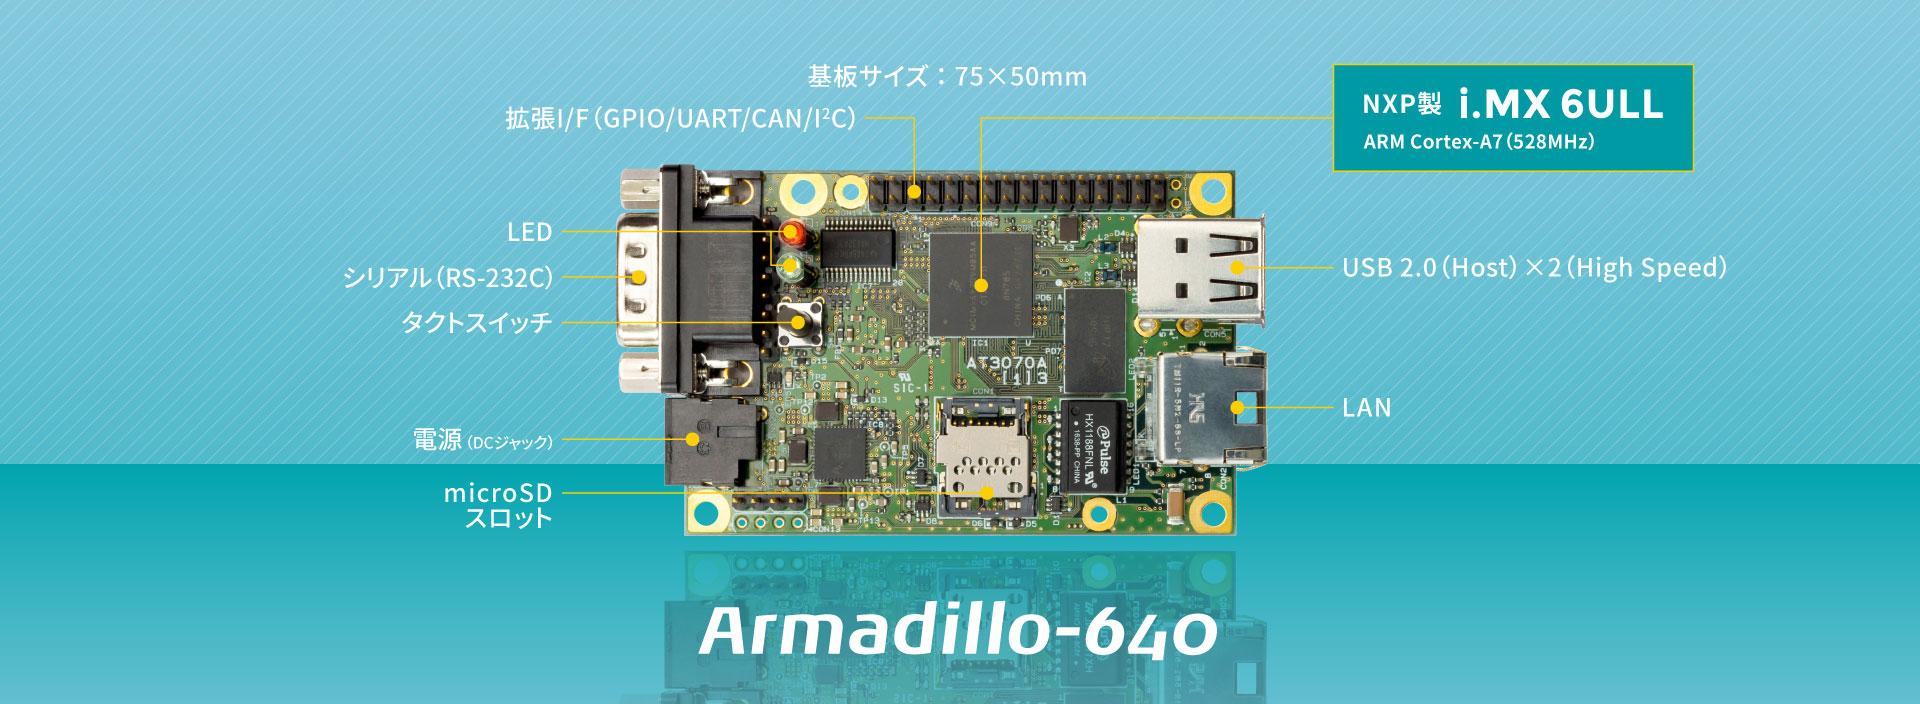 Armadillo-640イメージ画像